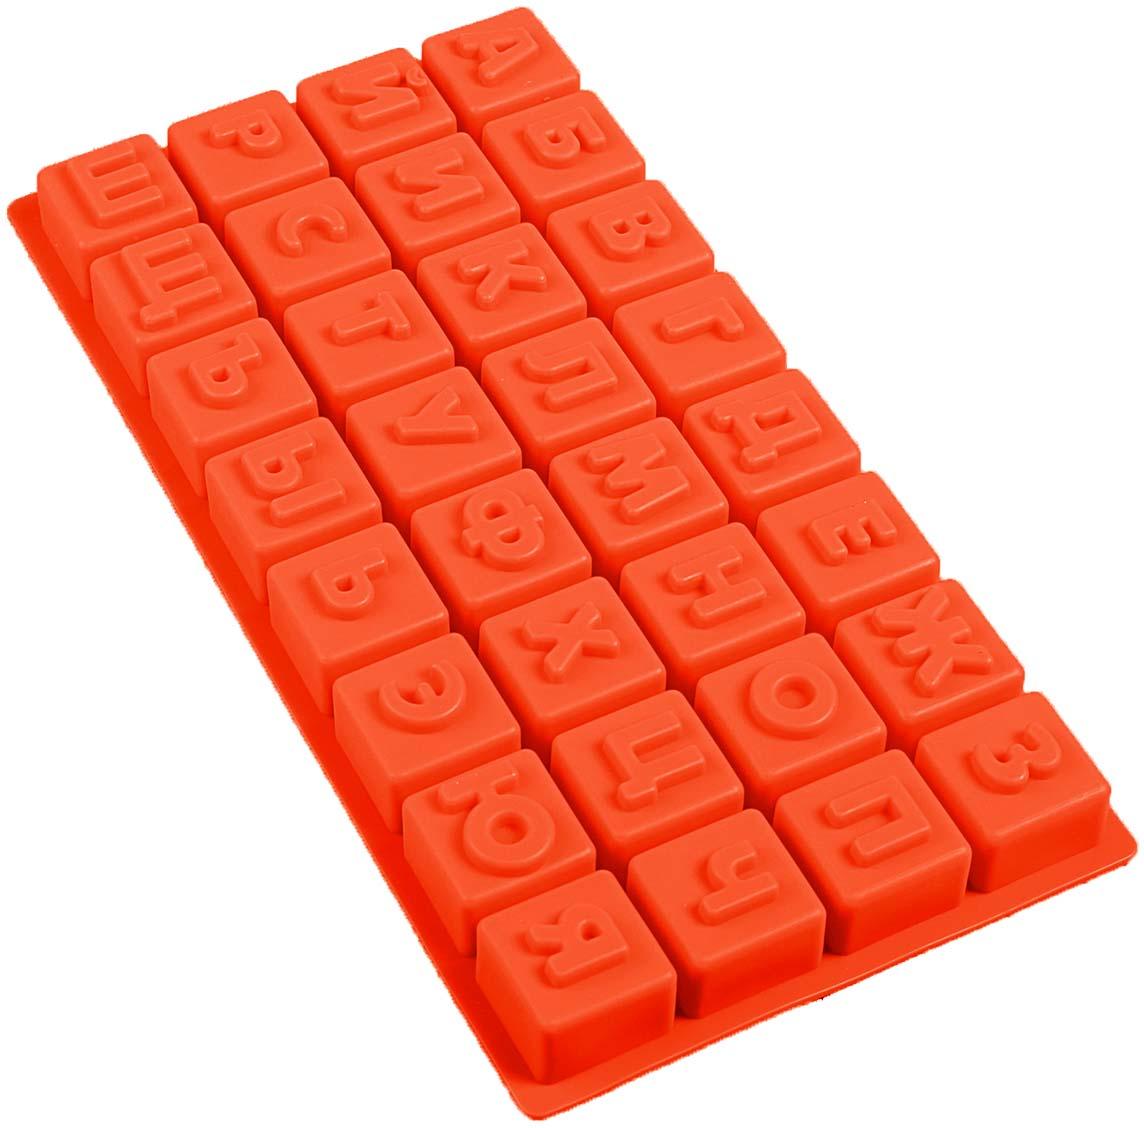 Форма для выпечки Доляна Алфавит, цвет: оранжевый, 35 х 18 х 3 см, 32 ячейки123155_оранжевыйФорма для выпечки Доляна Алфавит, цвет: оранжевый, 35 х 18 х 3 см, 32 ячейки